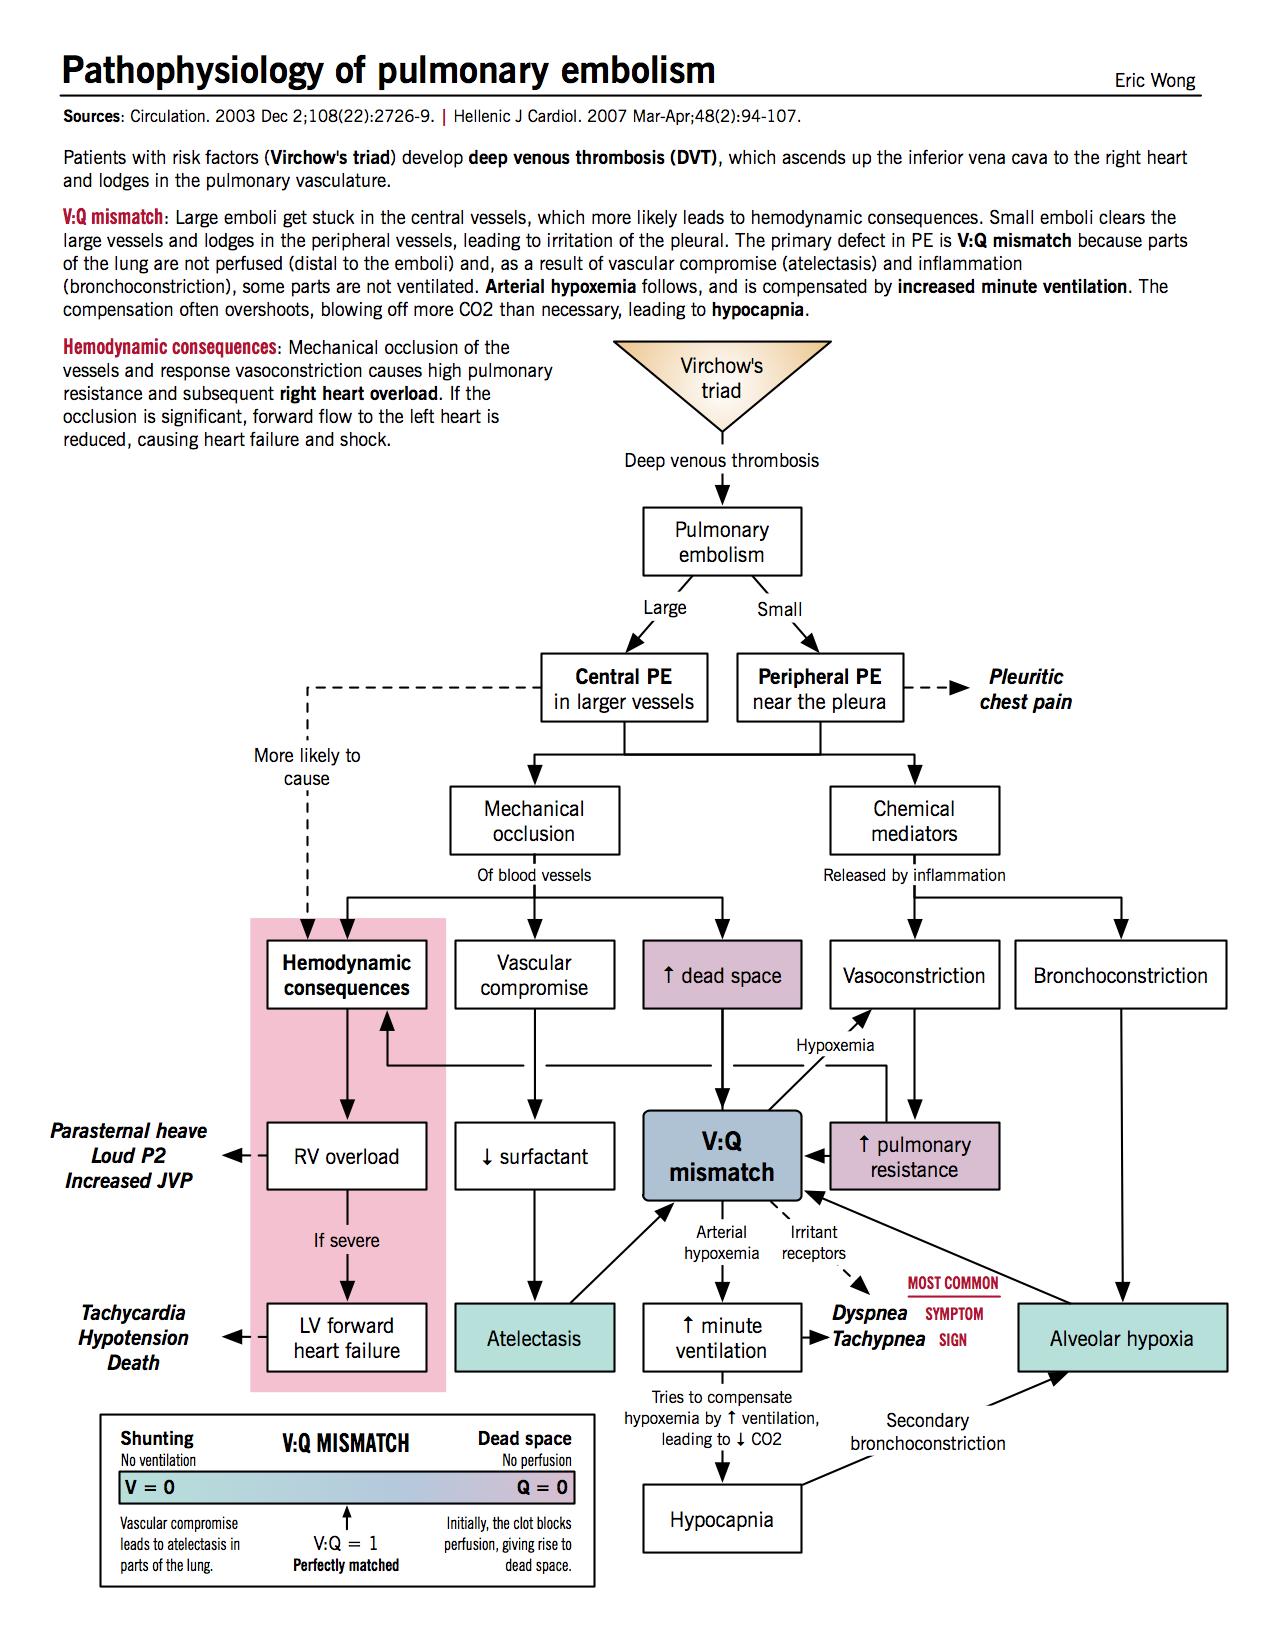 Pathophysiology of Pulmonary Embolism. #meded #foamed #medicine https://t.co/0xIDQlrRAP